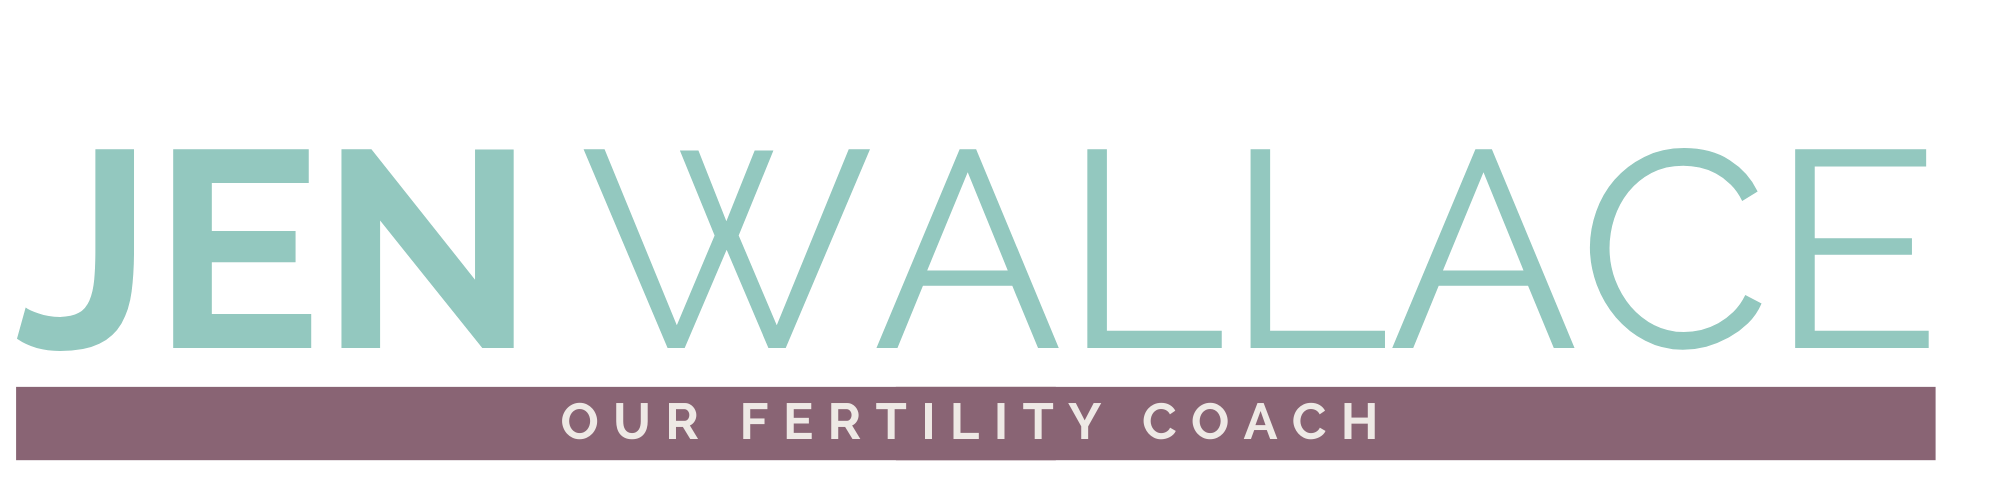 jen-wallace-fertility-coach-logo